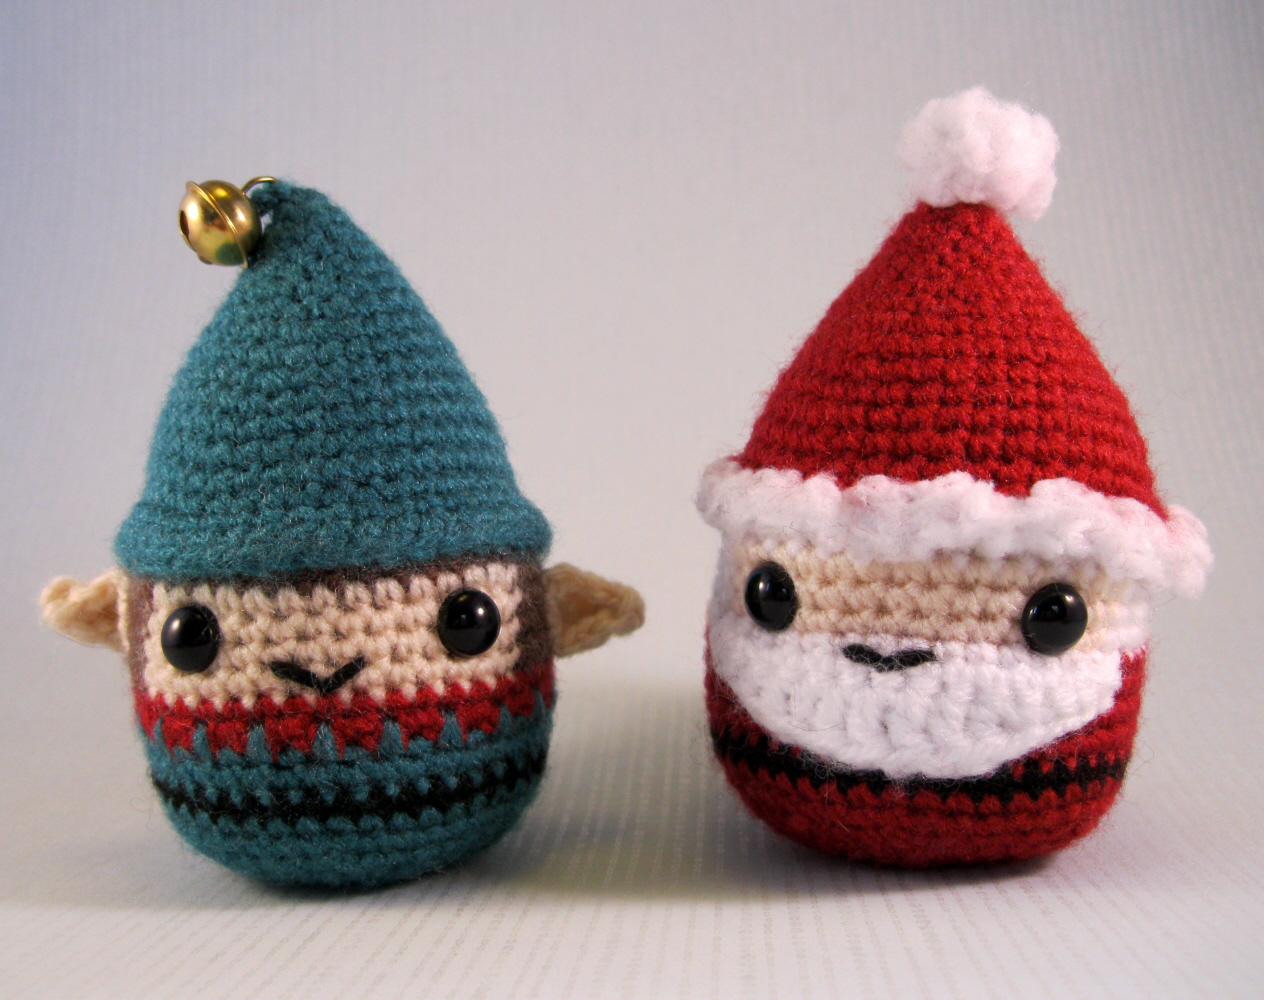 LucyRavenscar - Crochet Creatures: Little Christmas Mouse - free pattern